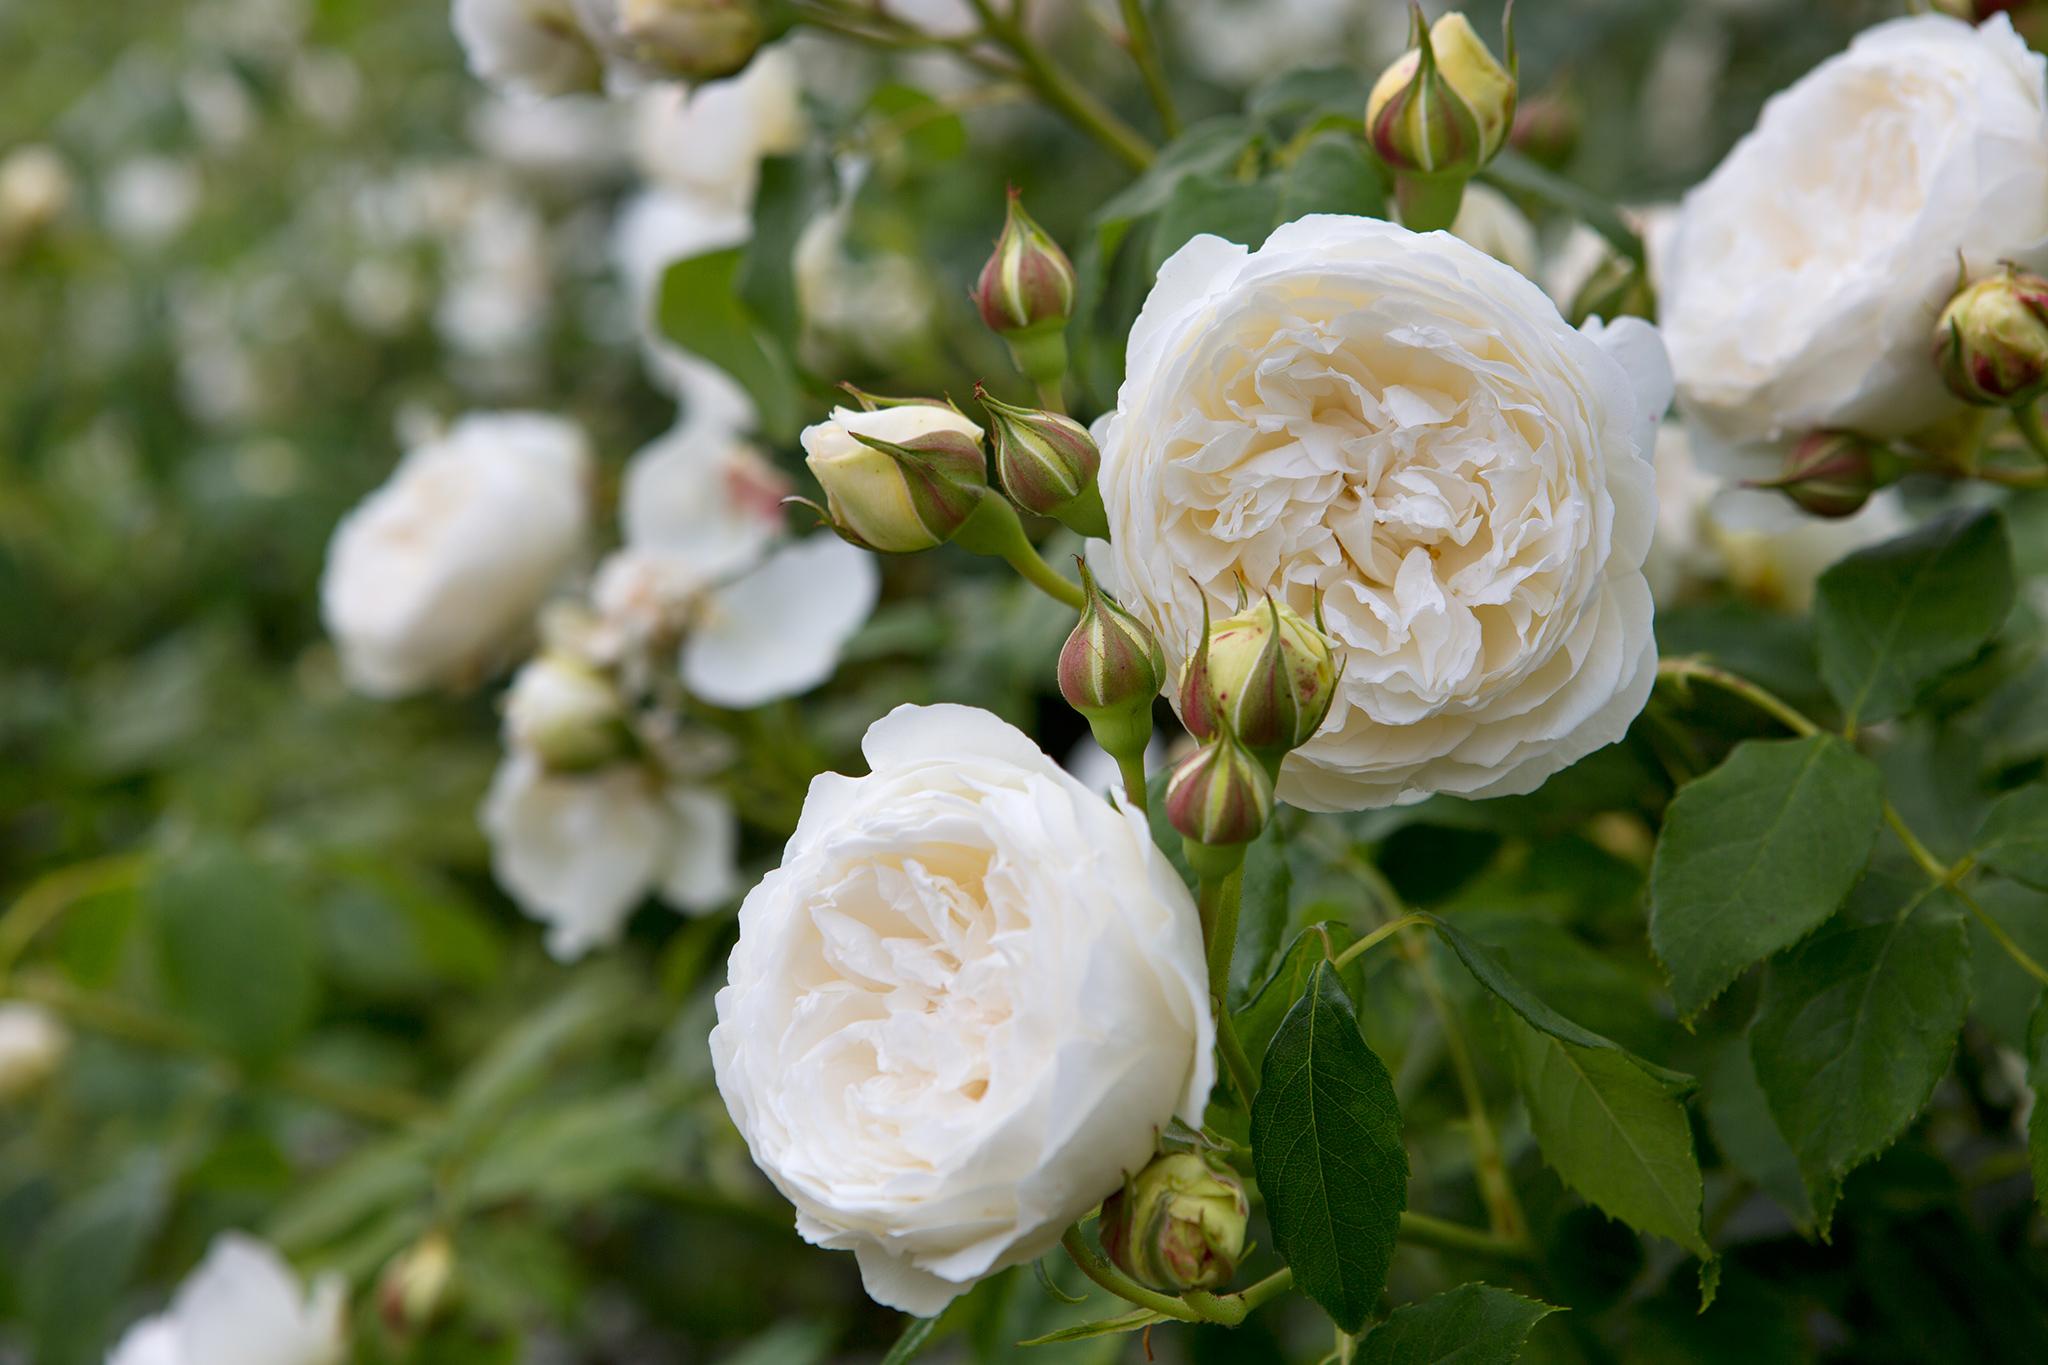 climbing-rose-rosa-claire-austin-3